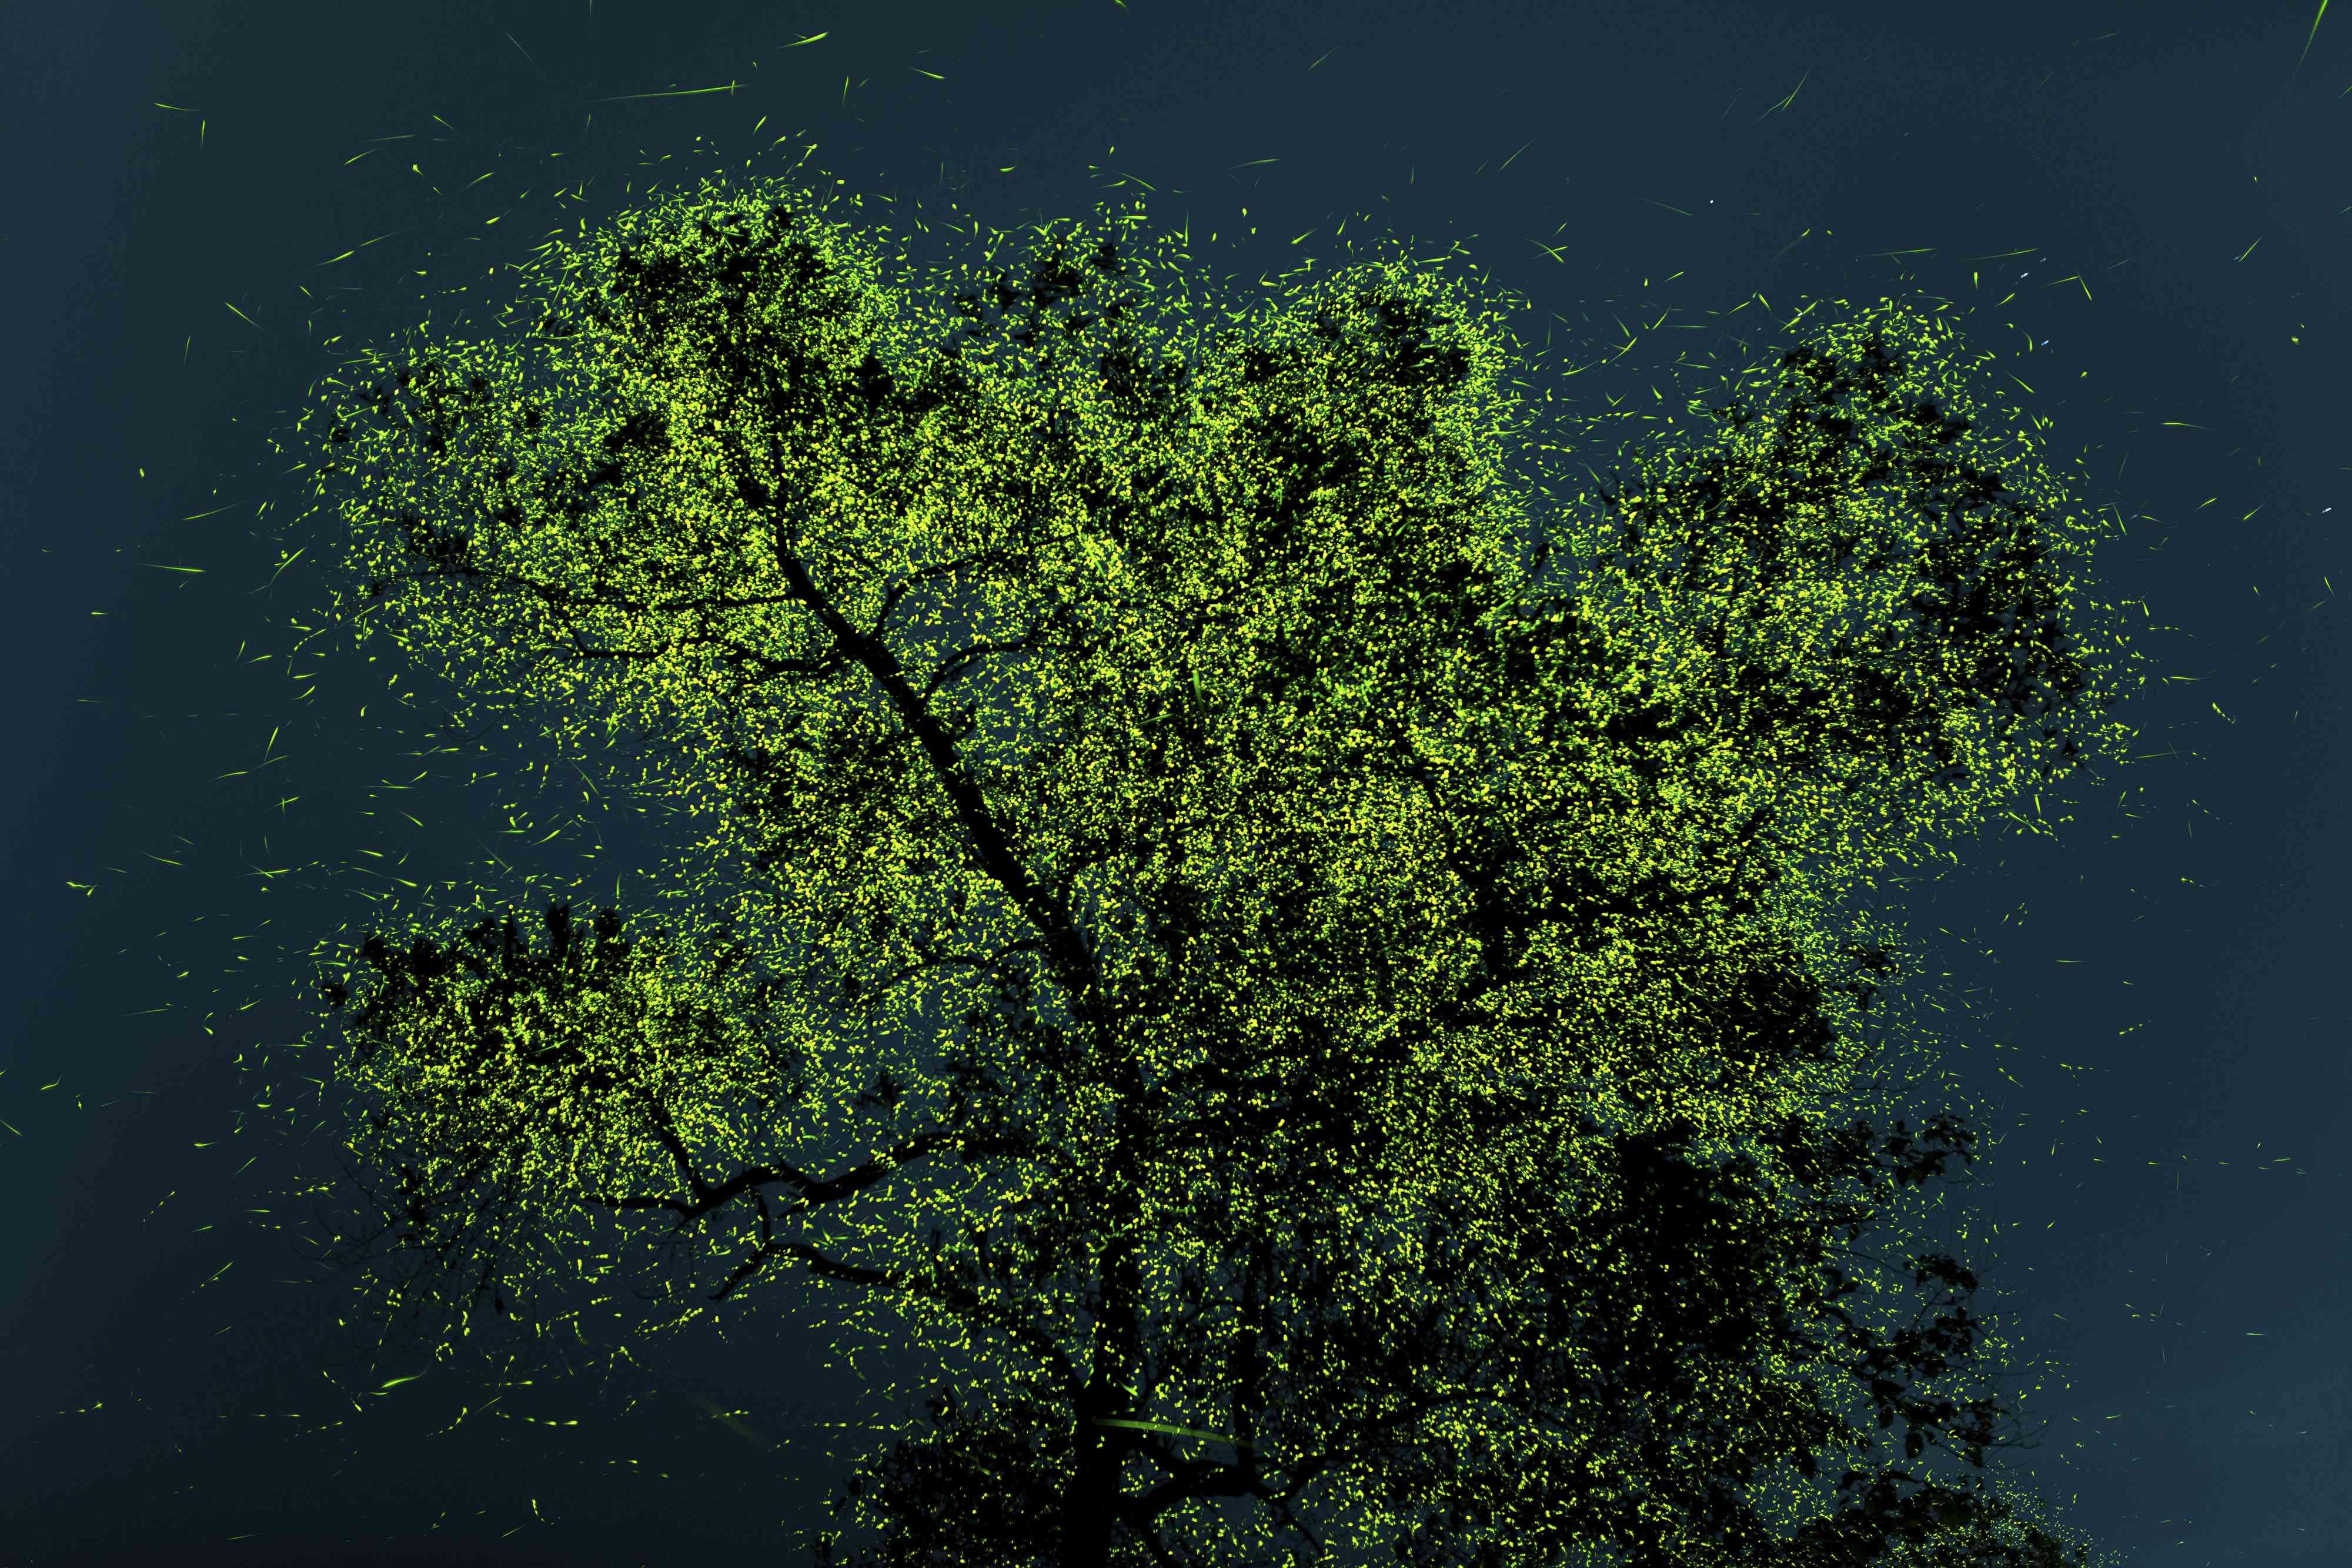 fireflies on tree